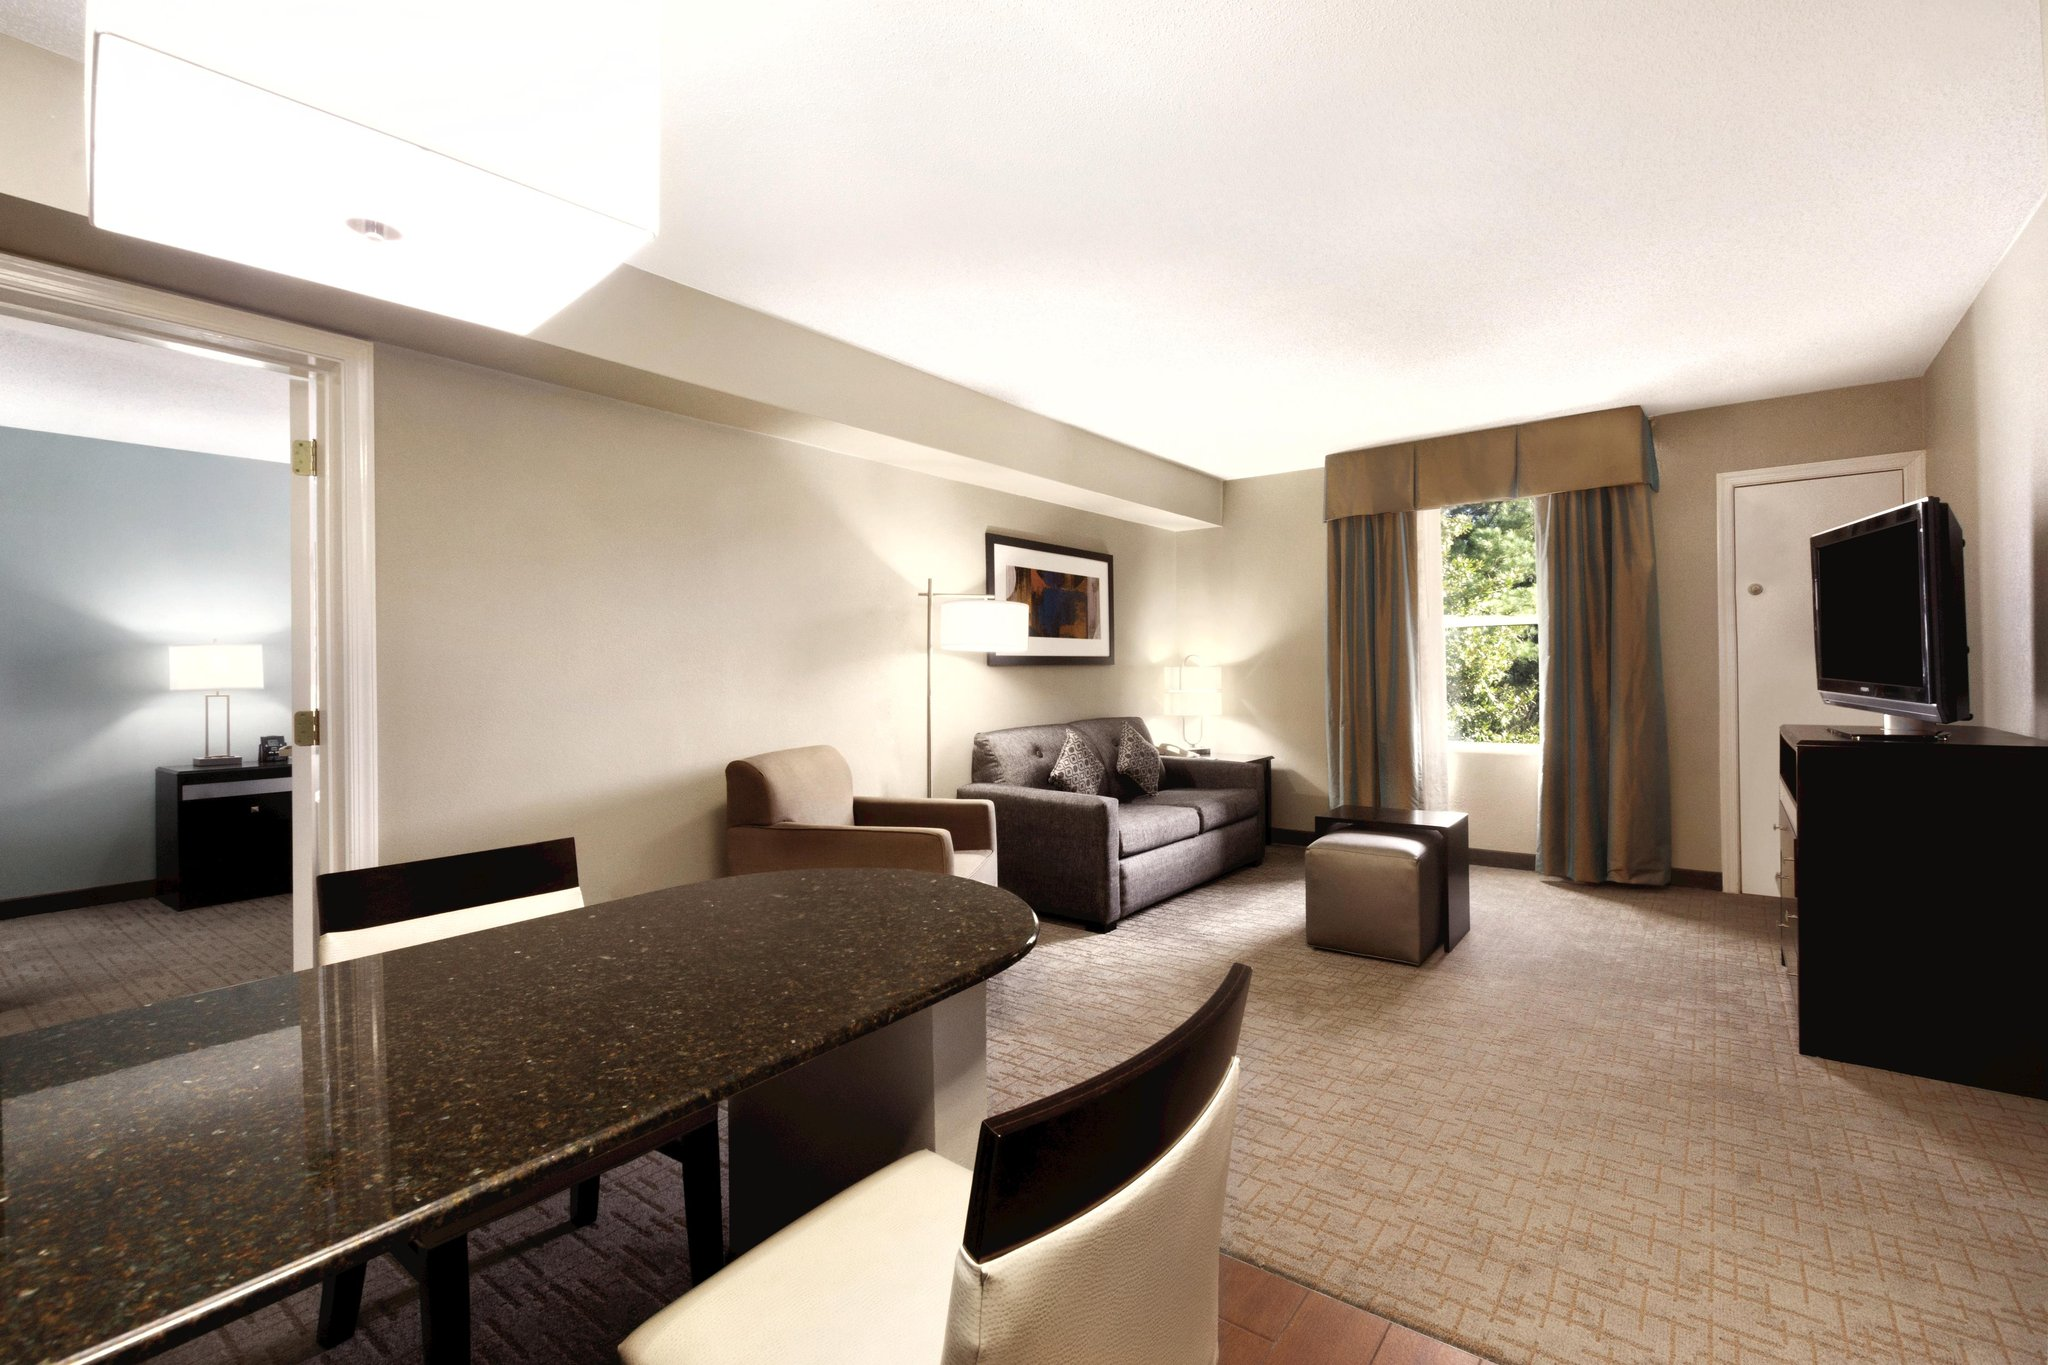 Meetings & Events at Homewood Suites by Hilton Atlanta-Alpharetta ...